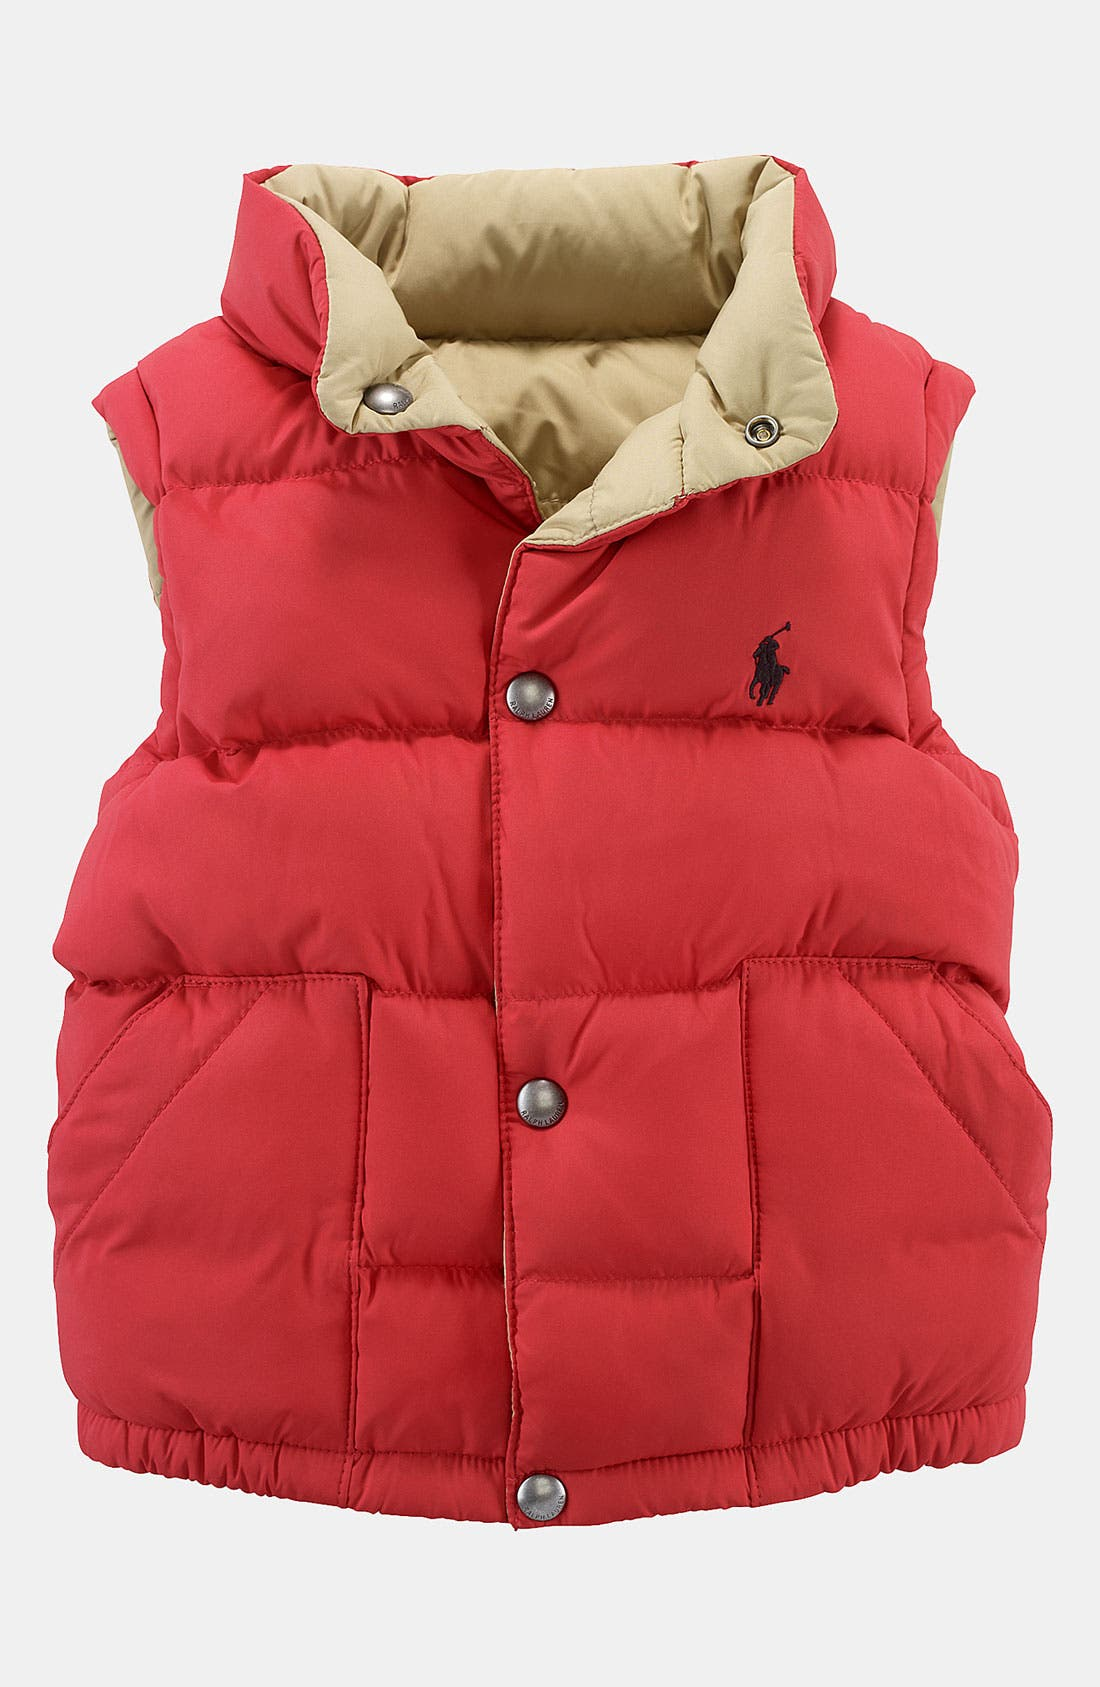 Alternate Image 1 Selected - Ralph Lauren Reversible Puffer Vest (Toddler)